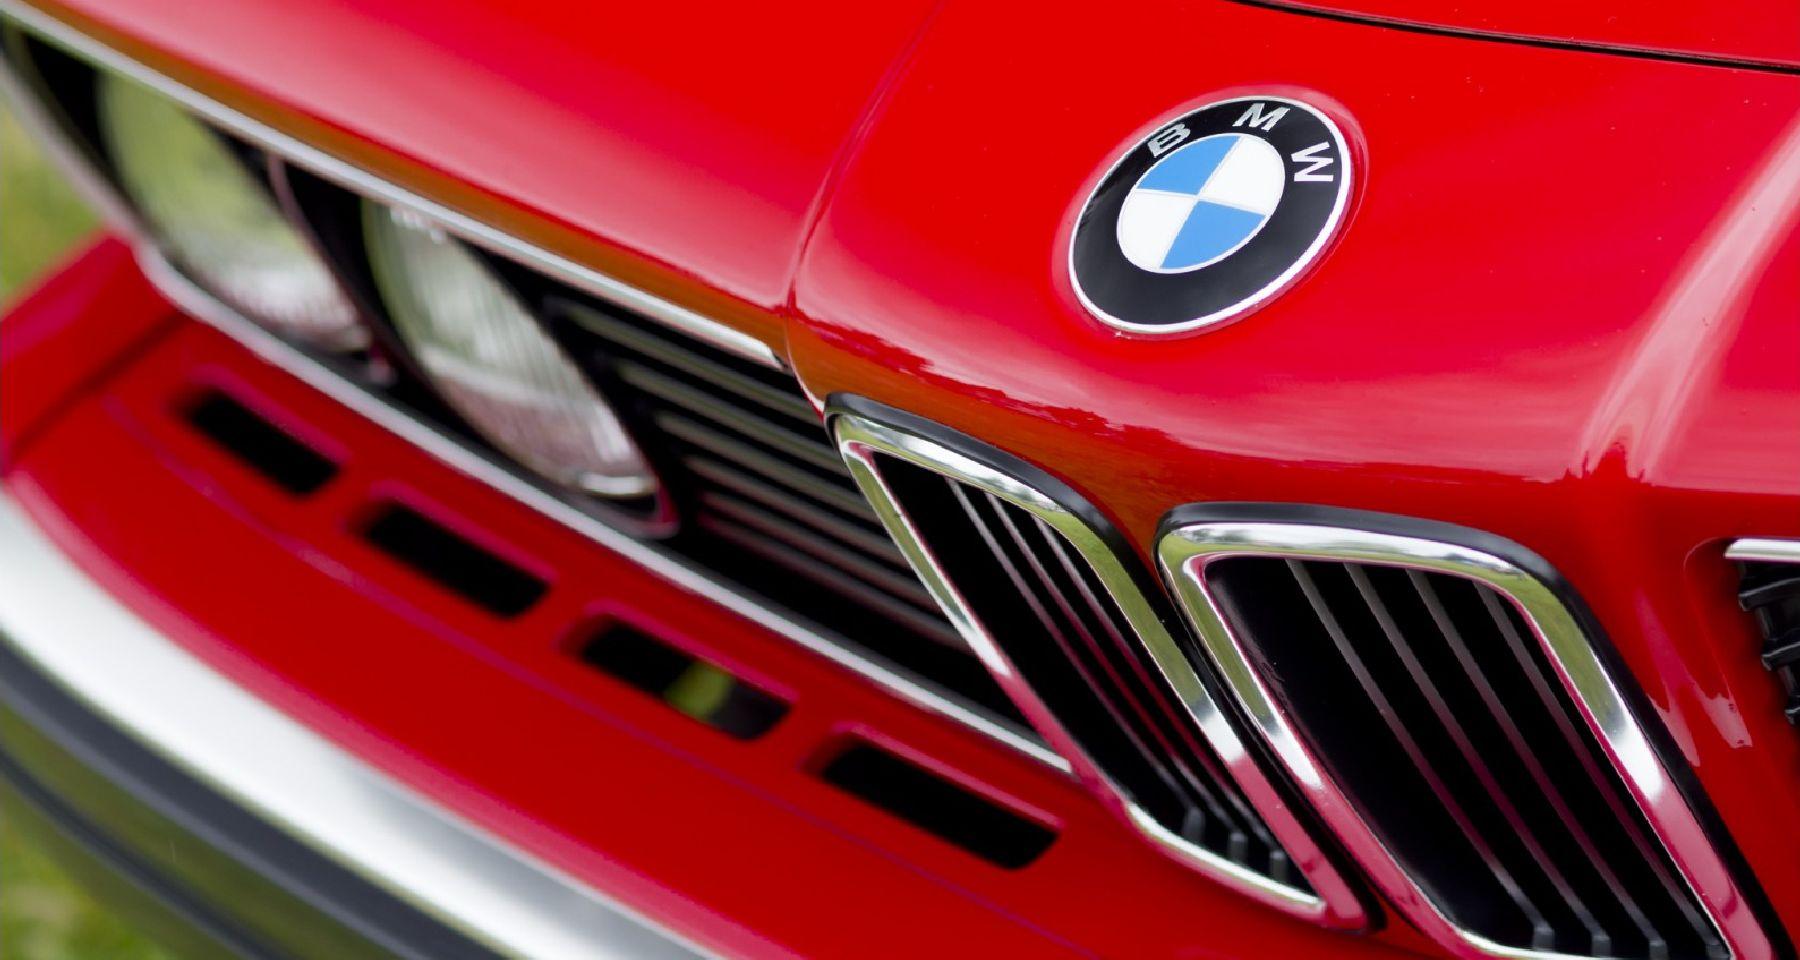 BMW : L'HISTOIRE DE LA MARQUE BAVAROISE